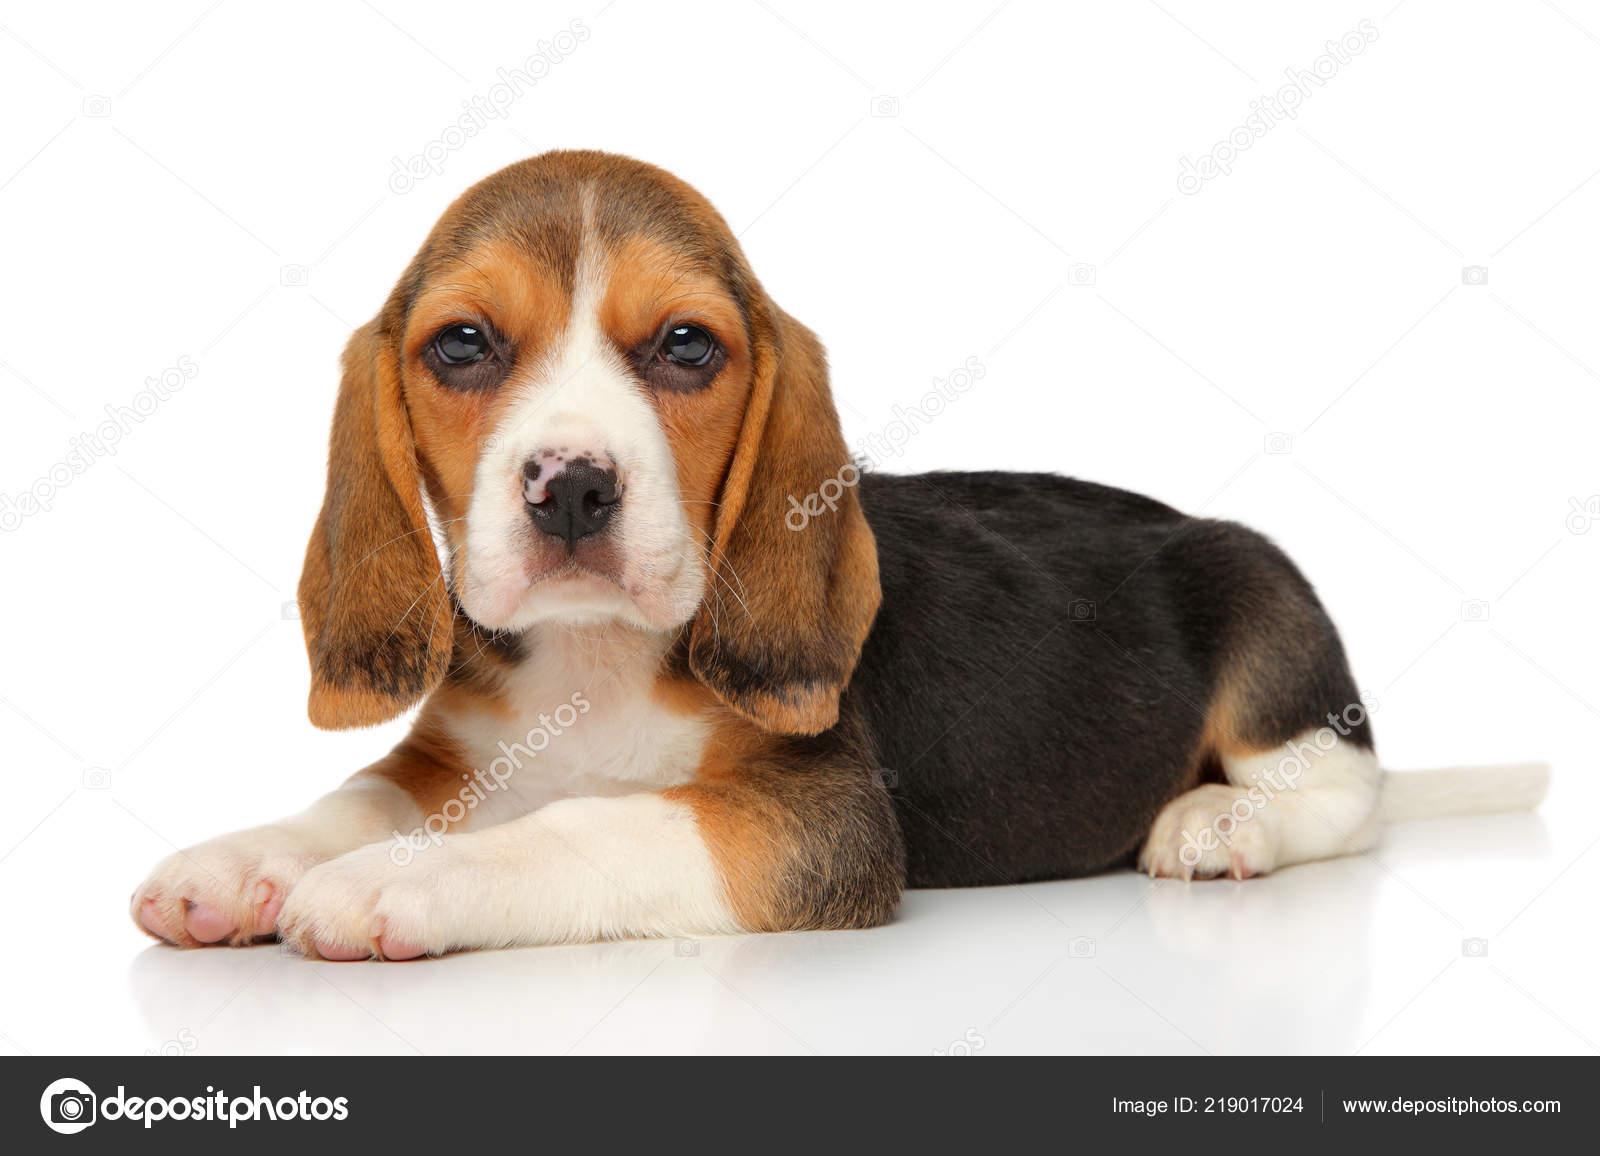 Cute Baby Beagles Beagle Puppy Lying White Background Baby Animal Theme Stock Photo C Fotojagodka 219017024